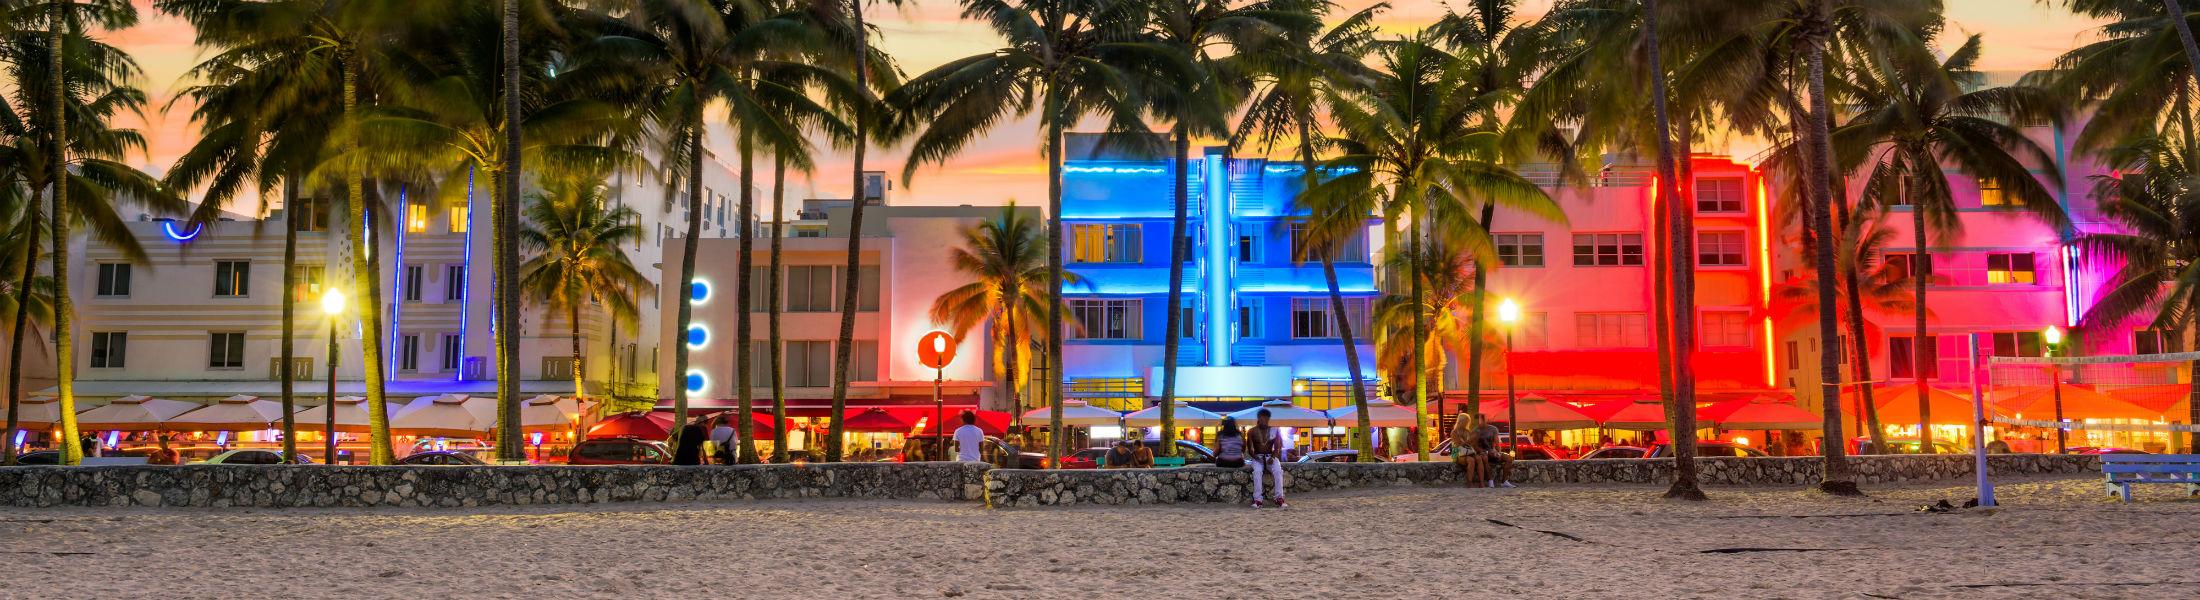 Miami Beach Florida USA on Ocean Drive